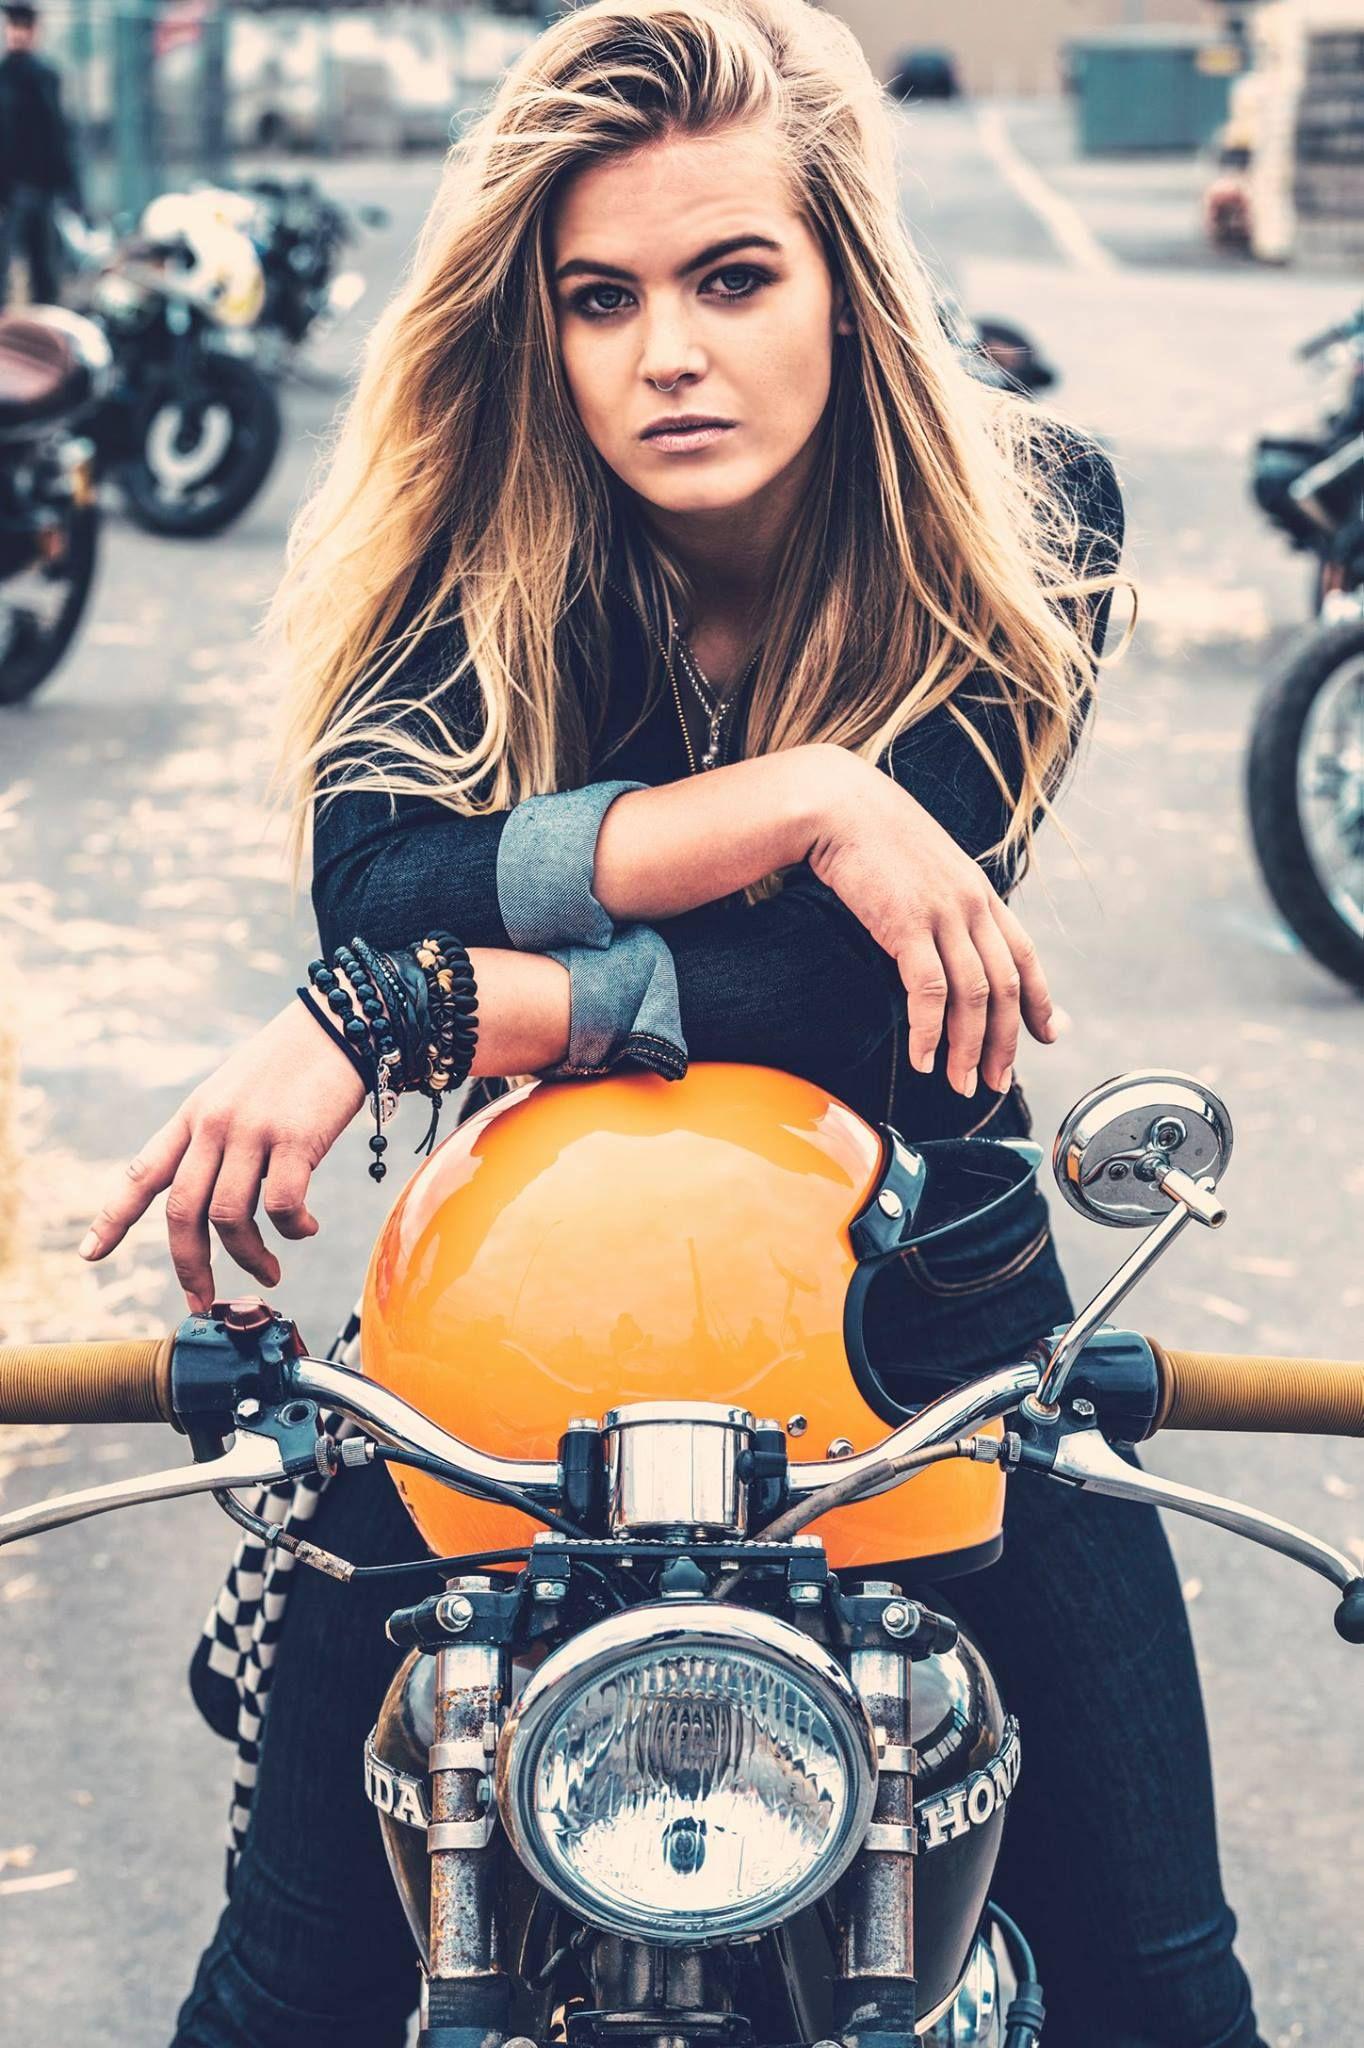 pintimothy nuss on bikes | pinterest | cafe racer moto, bikers